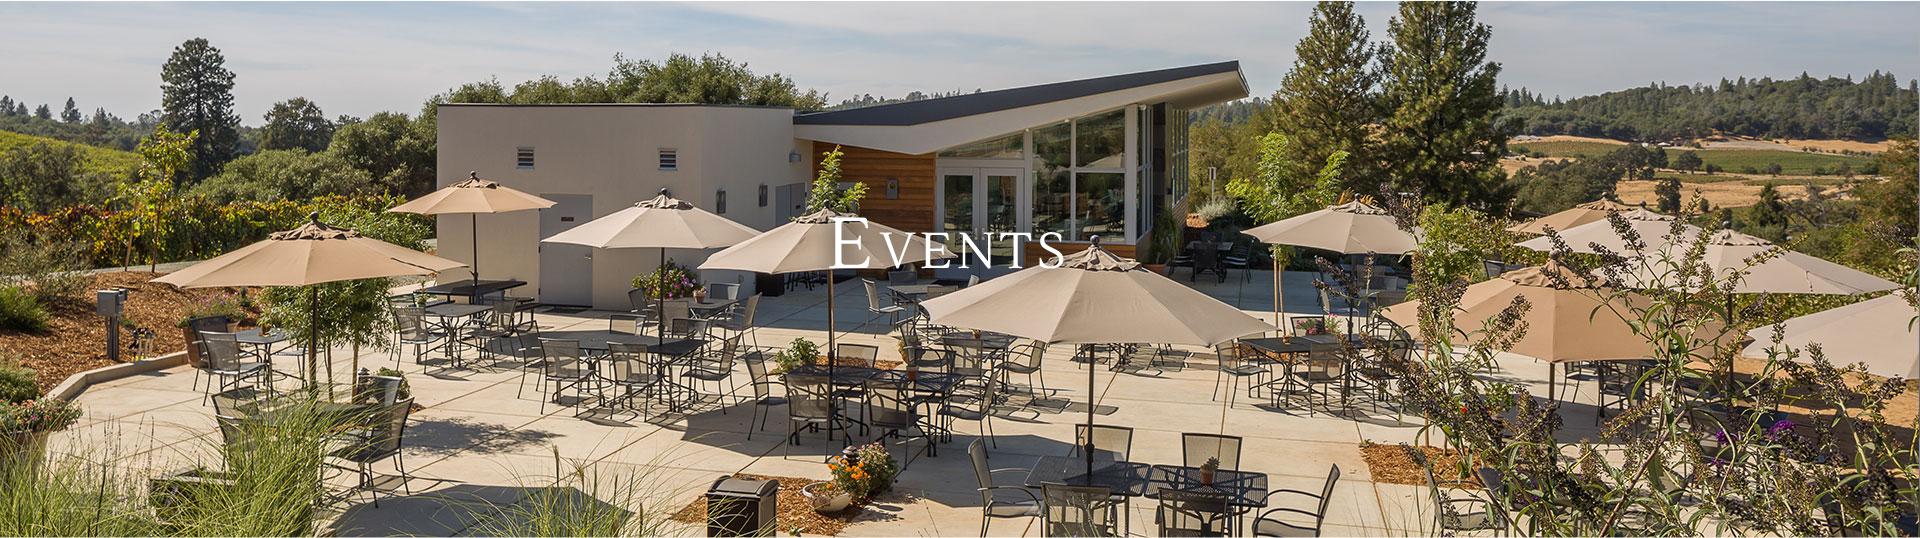 Iron Hub Winery Events